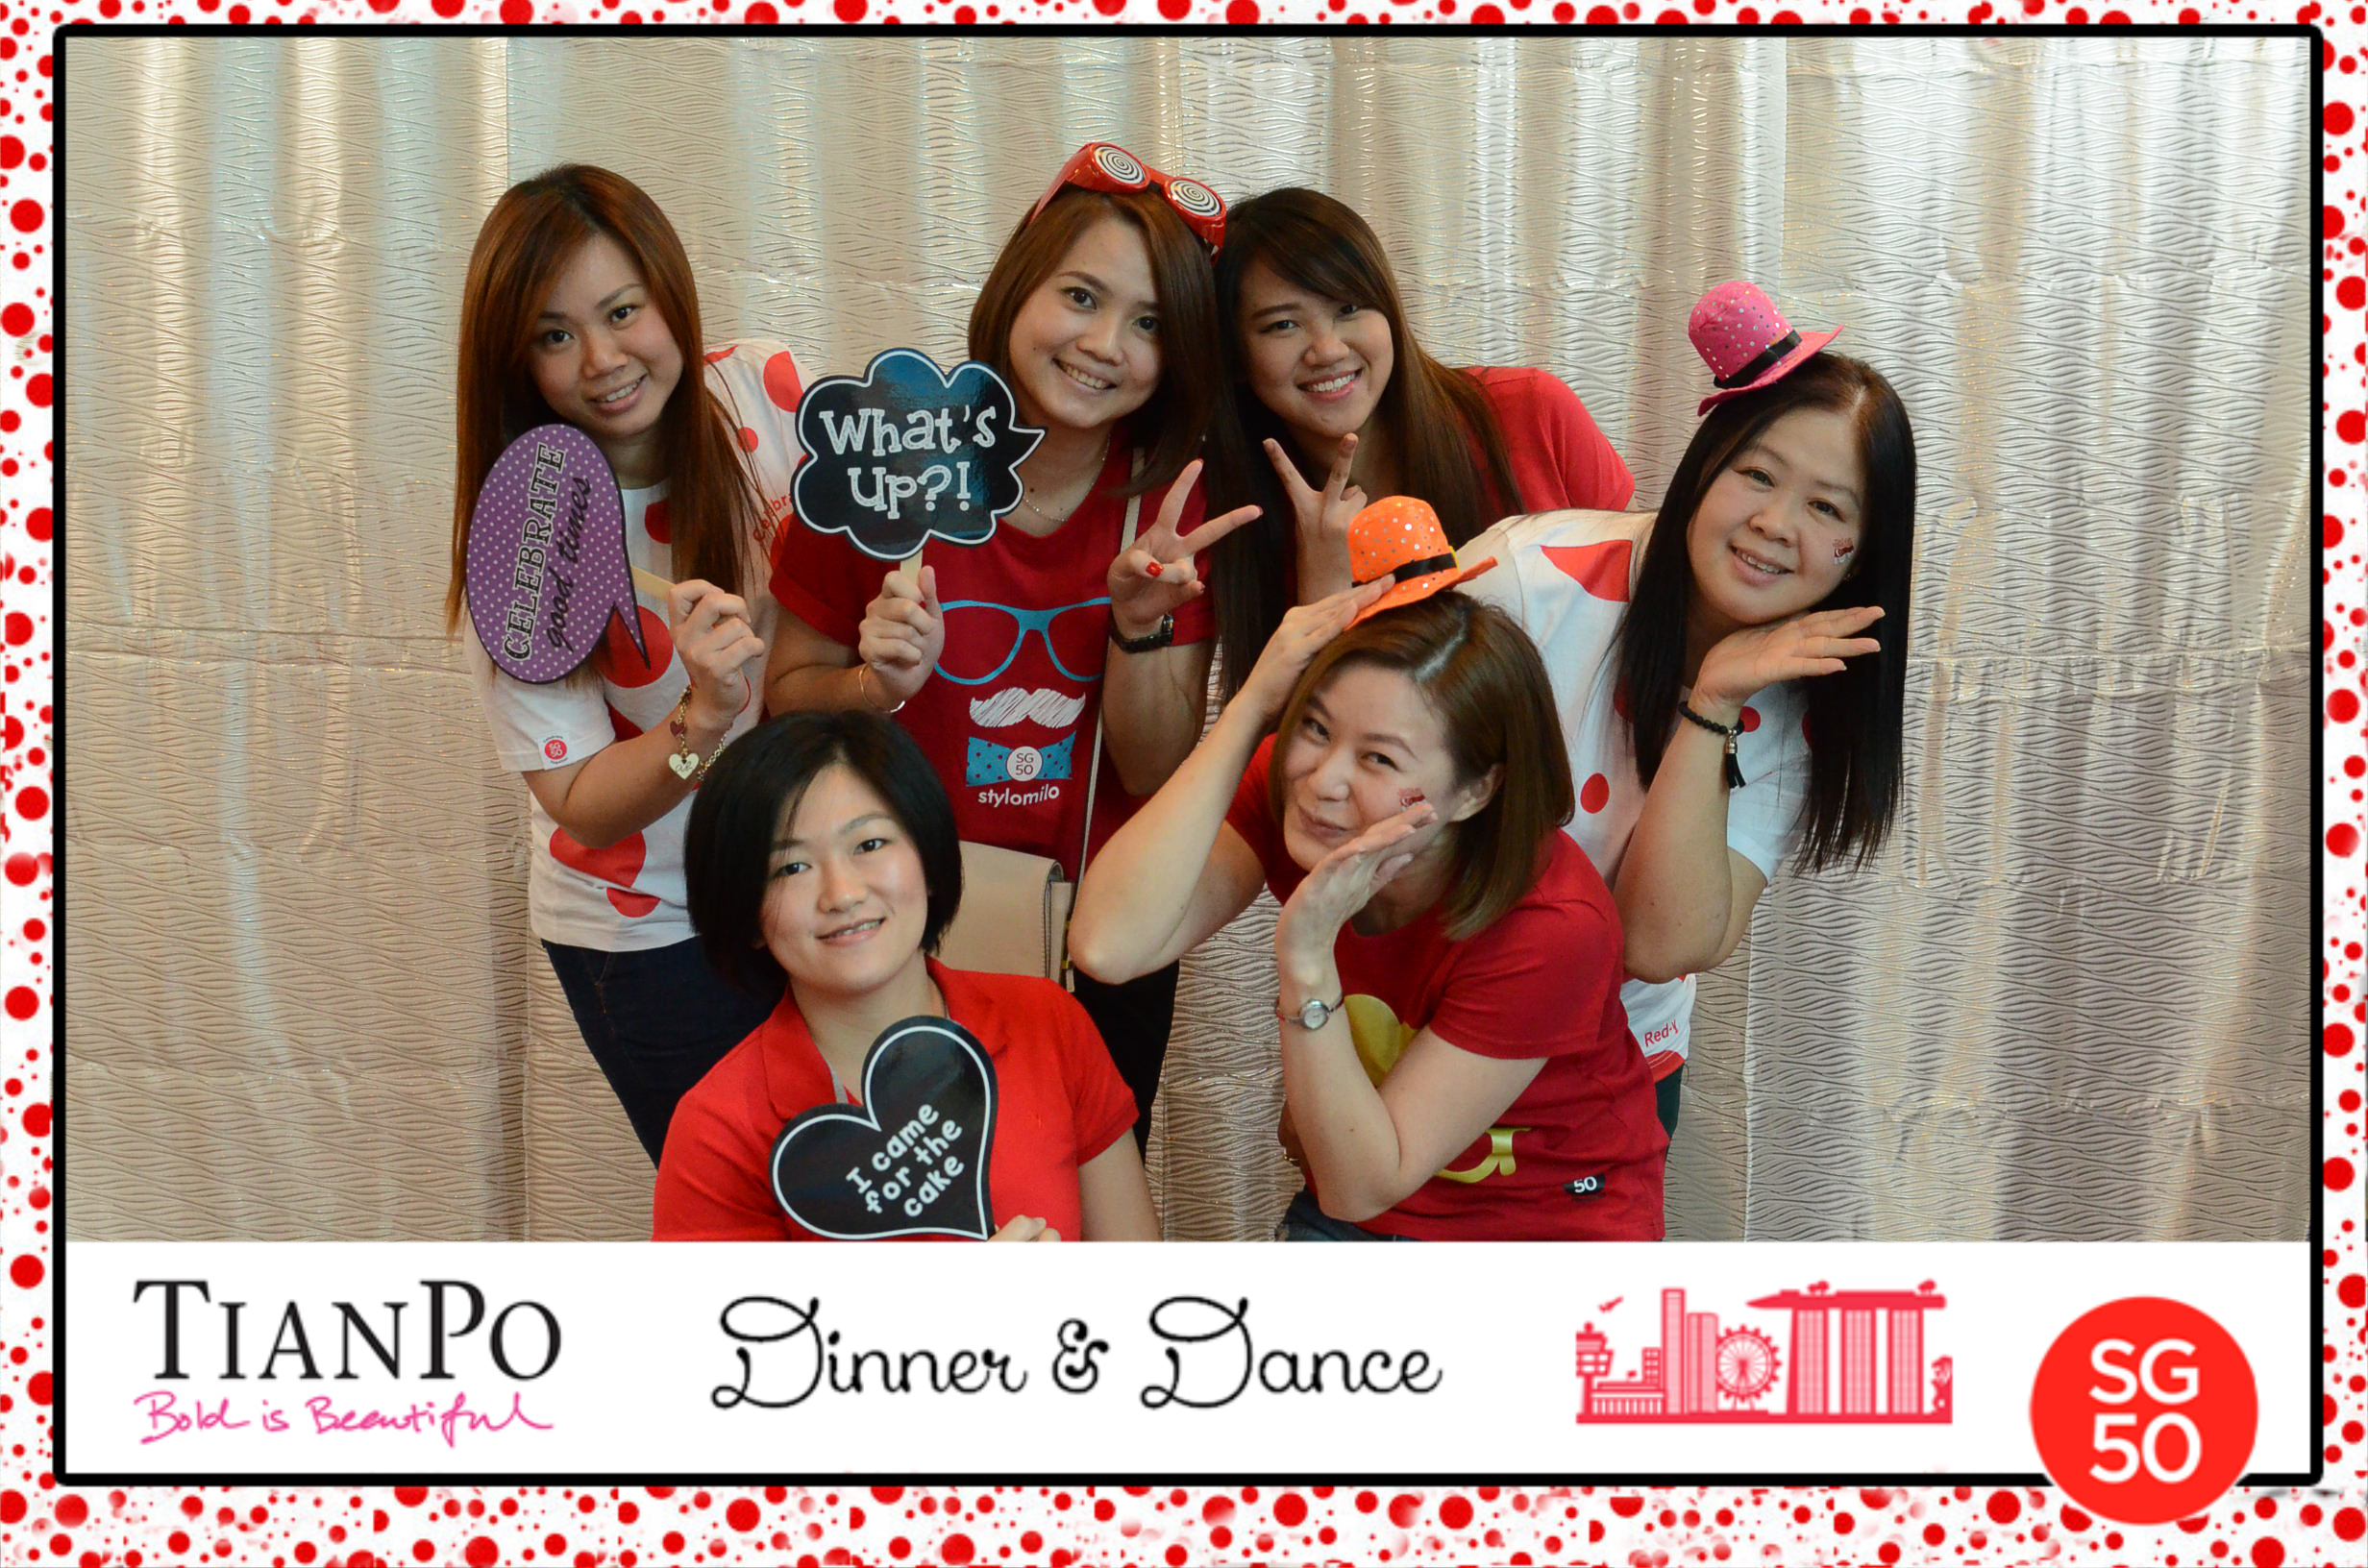 Tianpo-55.jpg